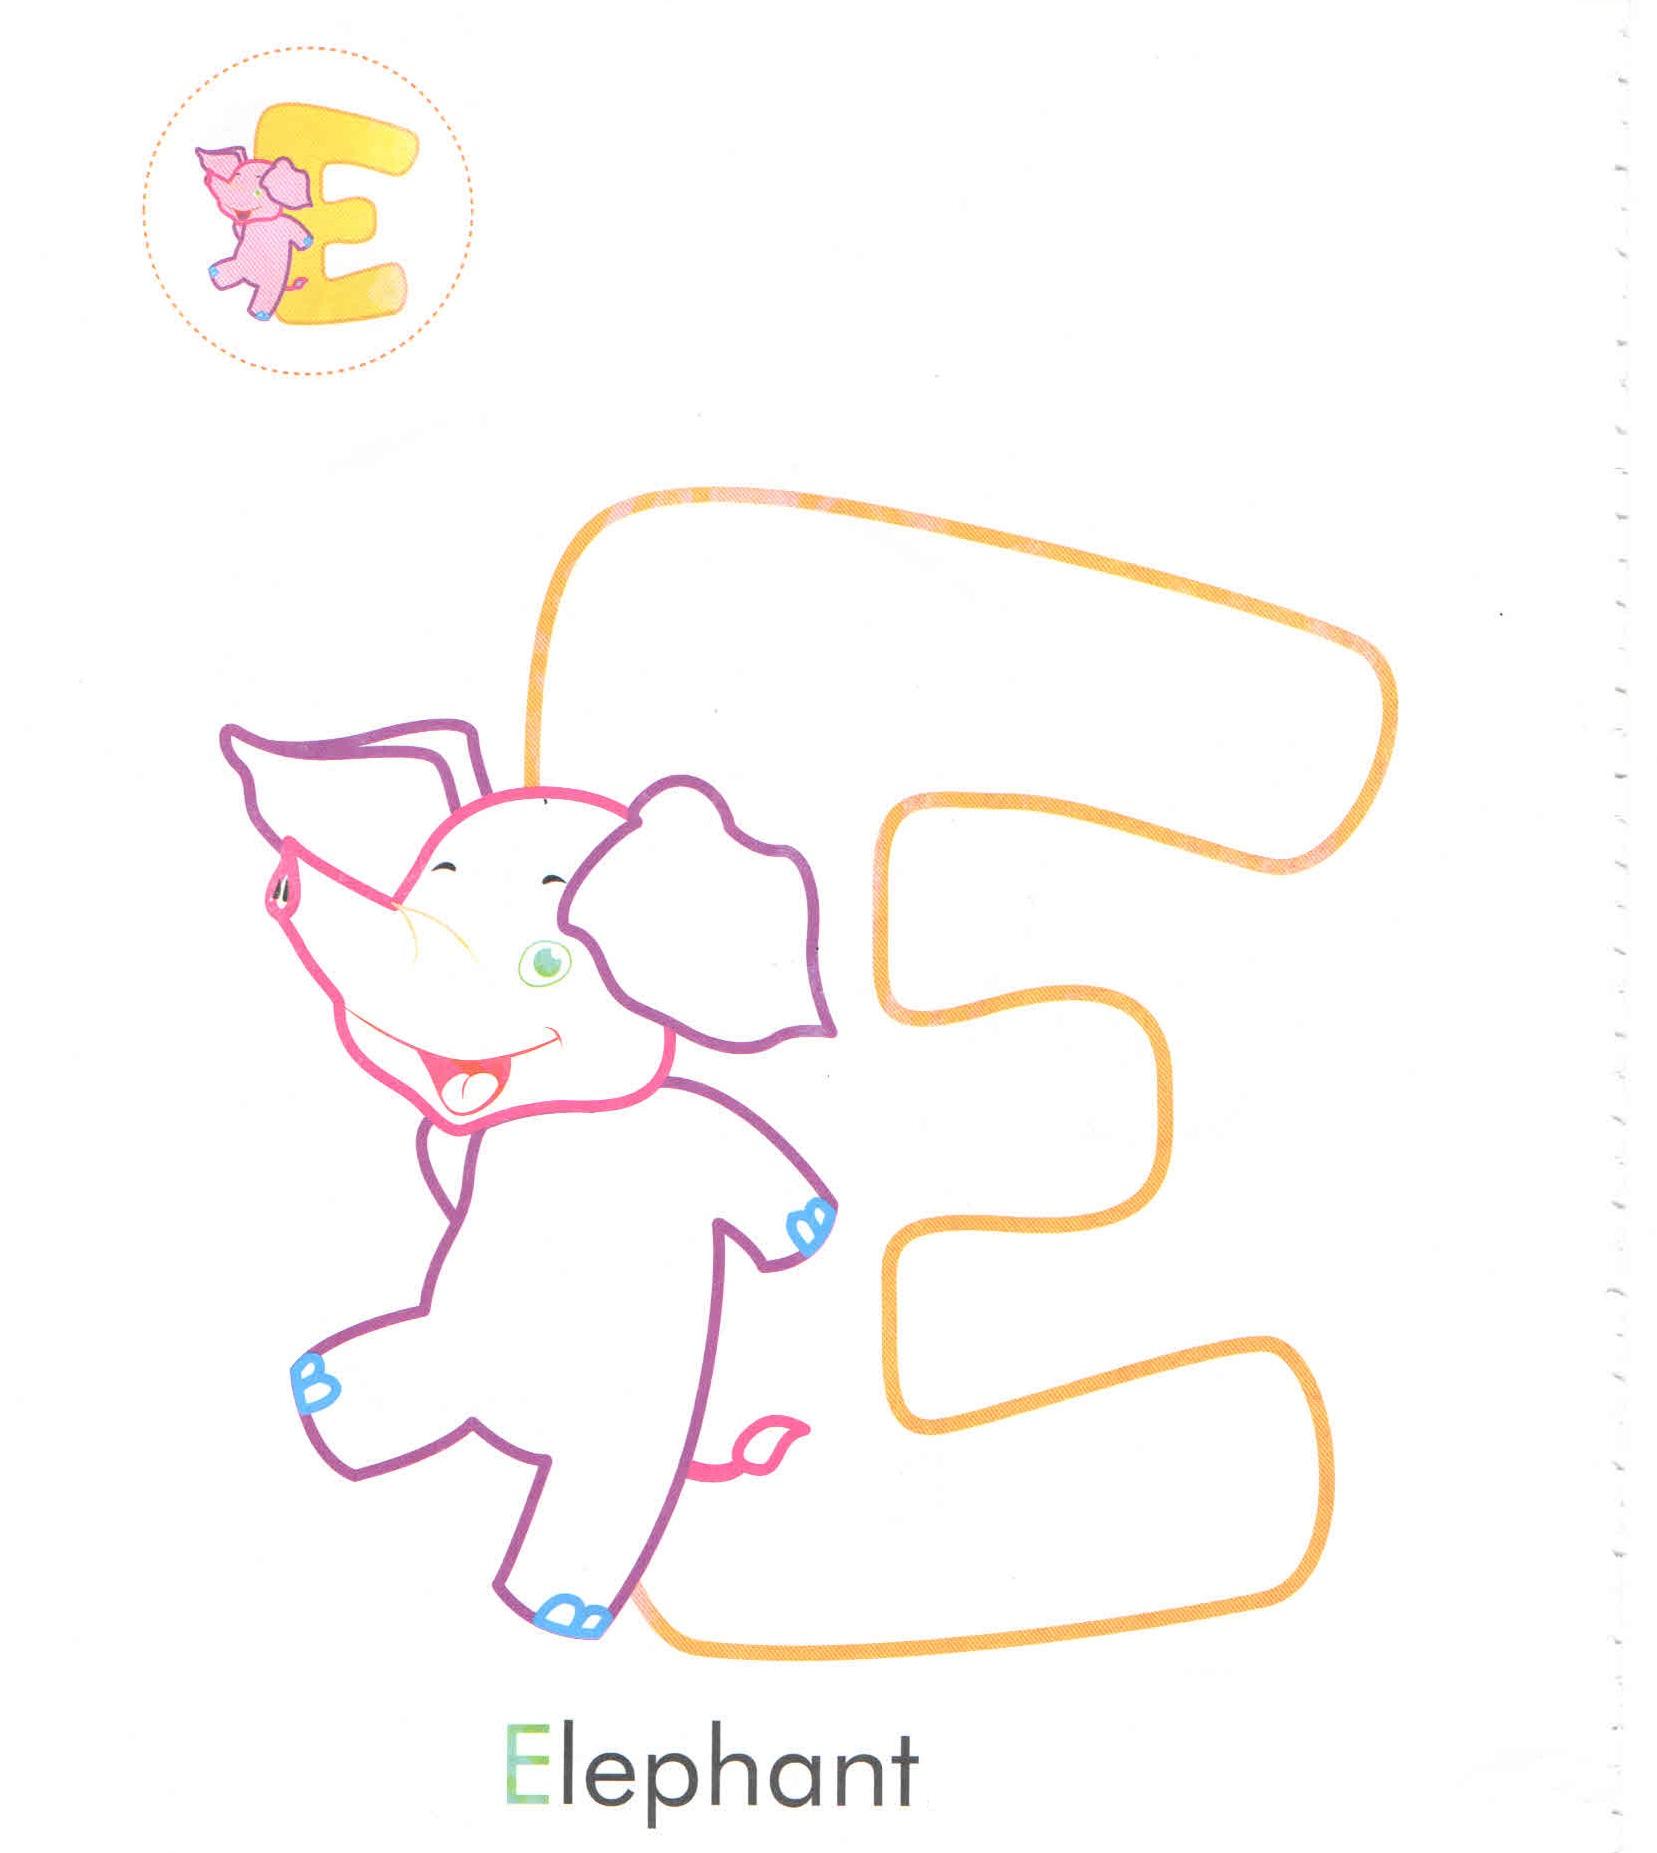 Alphabet Letter E Elephant Coloring Page For Preschool